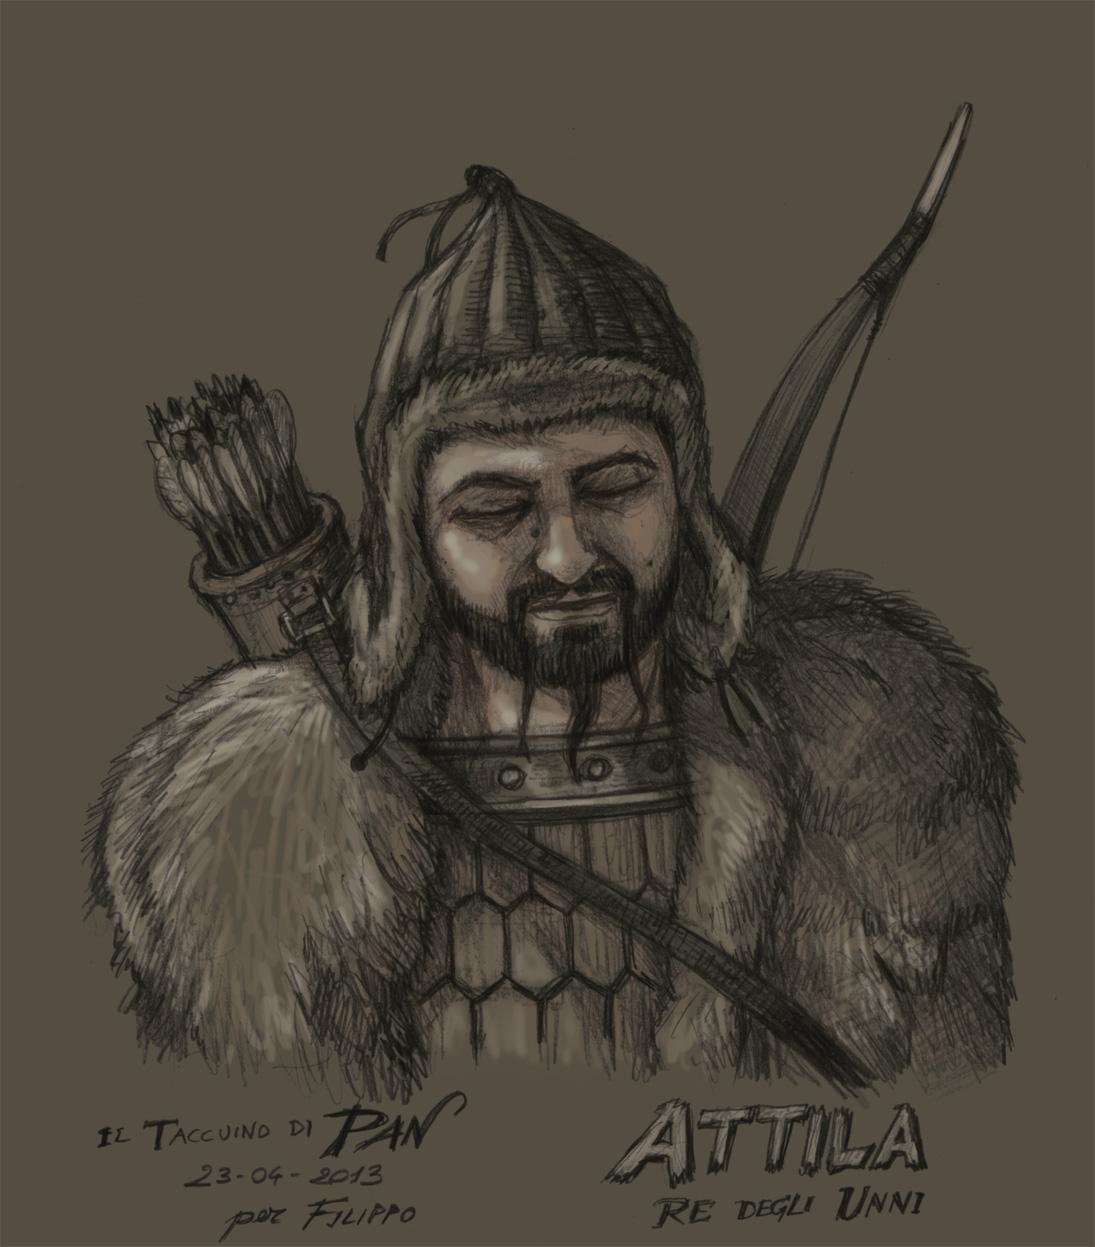 Attila, Ruler of the Hunnic Empire by Panaiotis